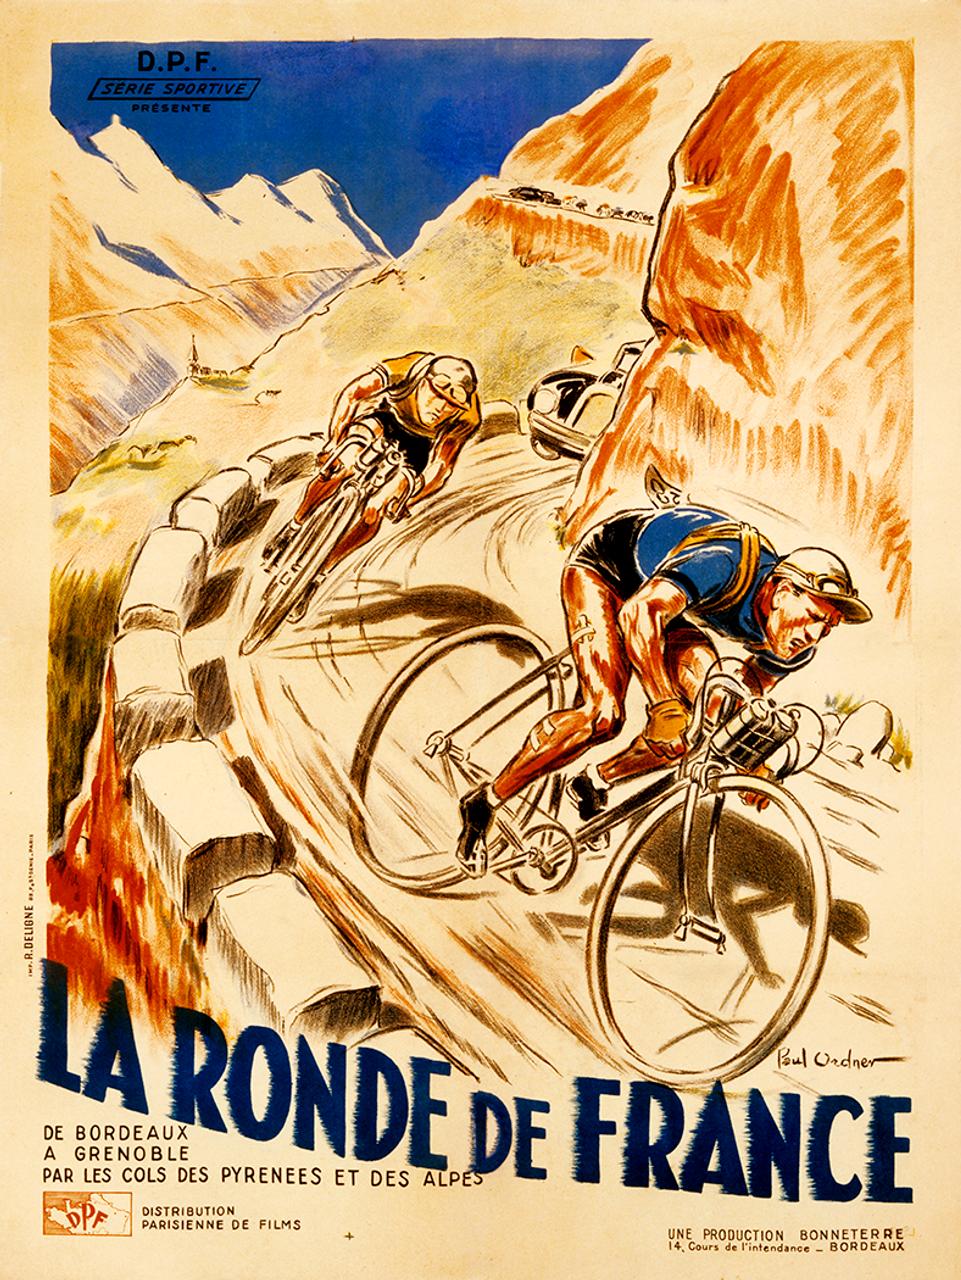 La Ronde de France Bicycle Poster by Paul Ordner